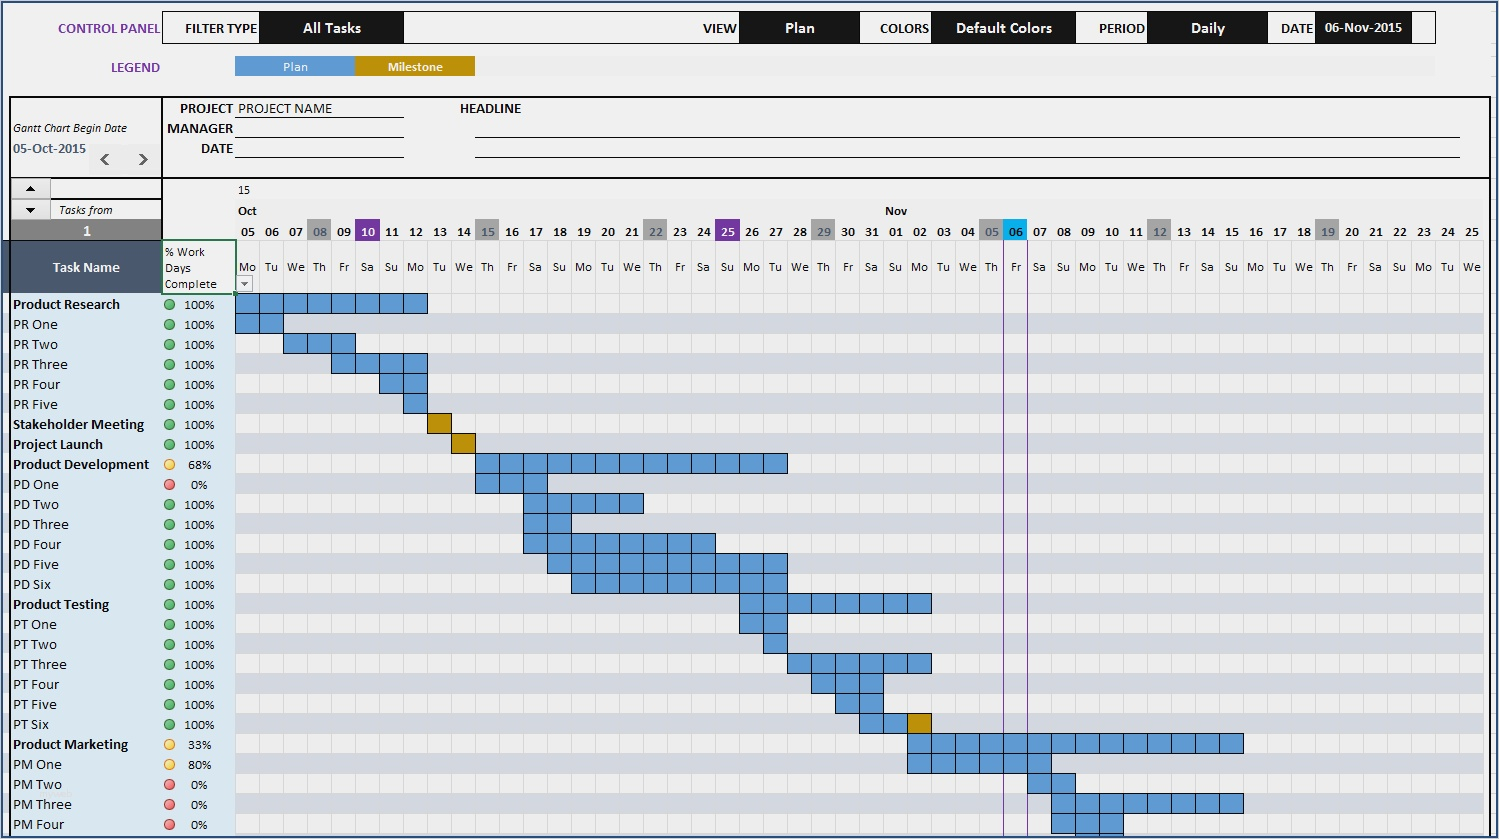 Excel 2010 Gantt Diagramm Vorlage Wunderbar Gantt Chart Maker Excel And Gantt Chart Template Excel 2010 Free Download